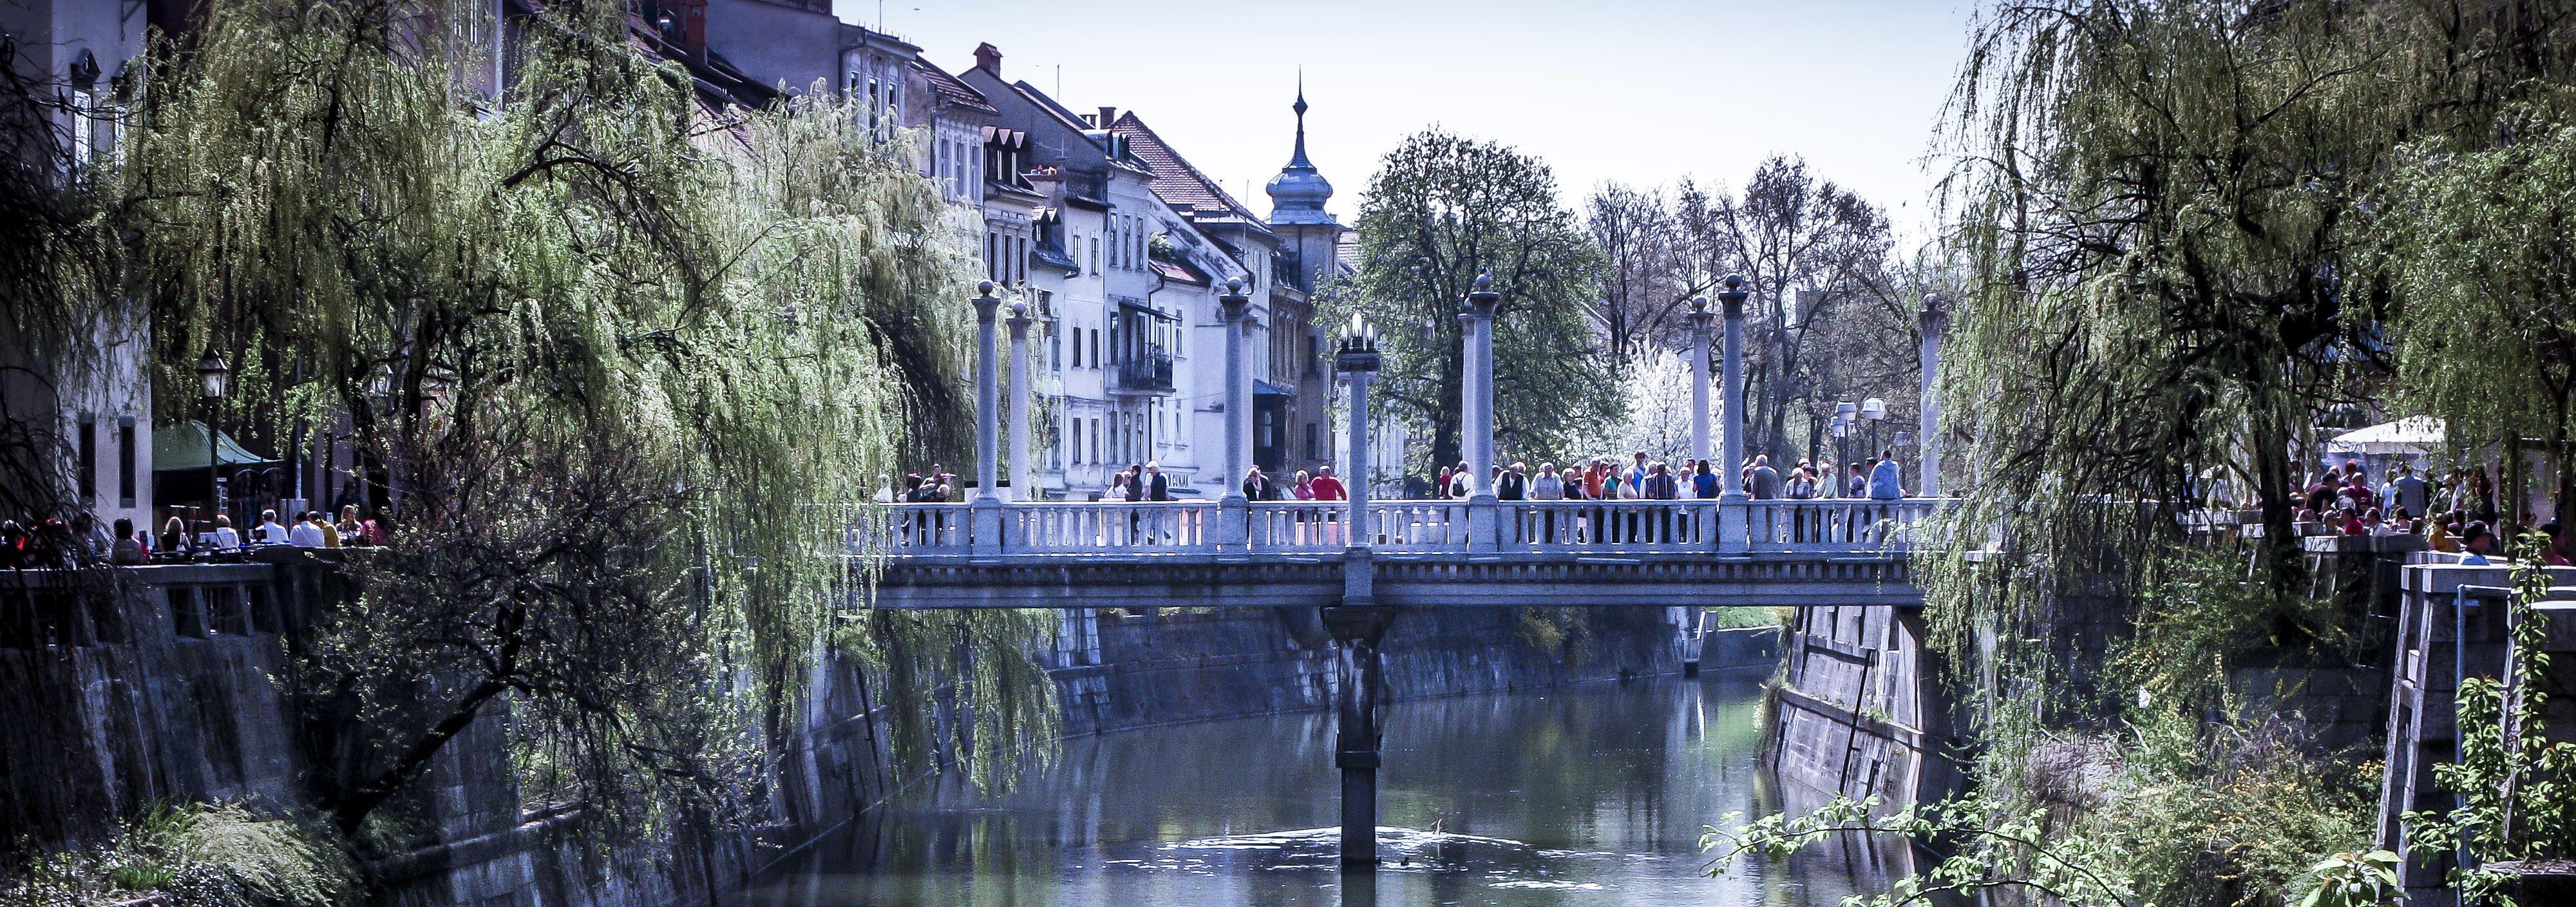 Il ponte dei calzolai - Lubiana